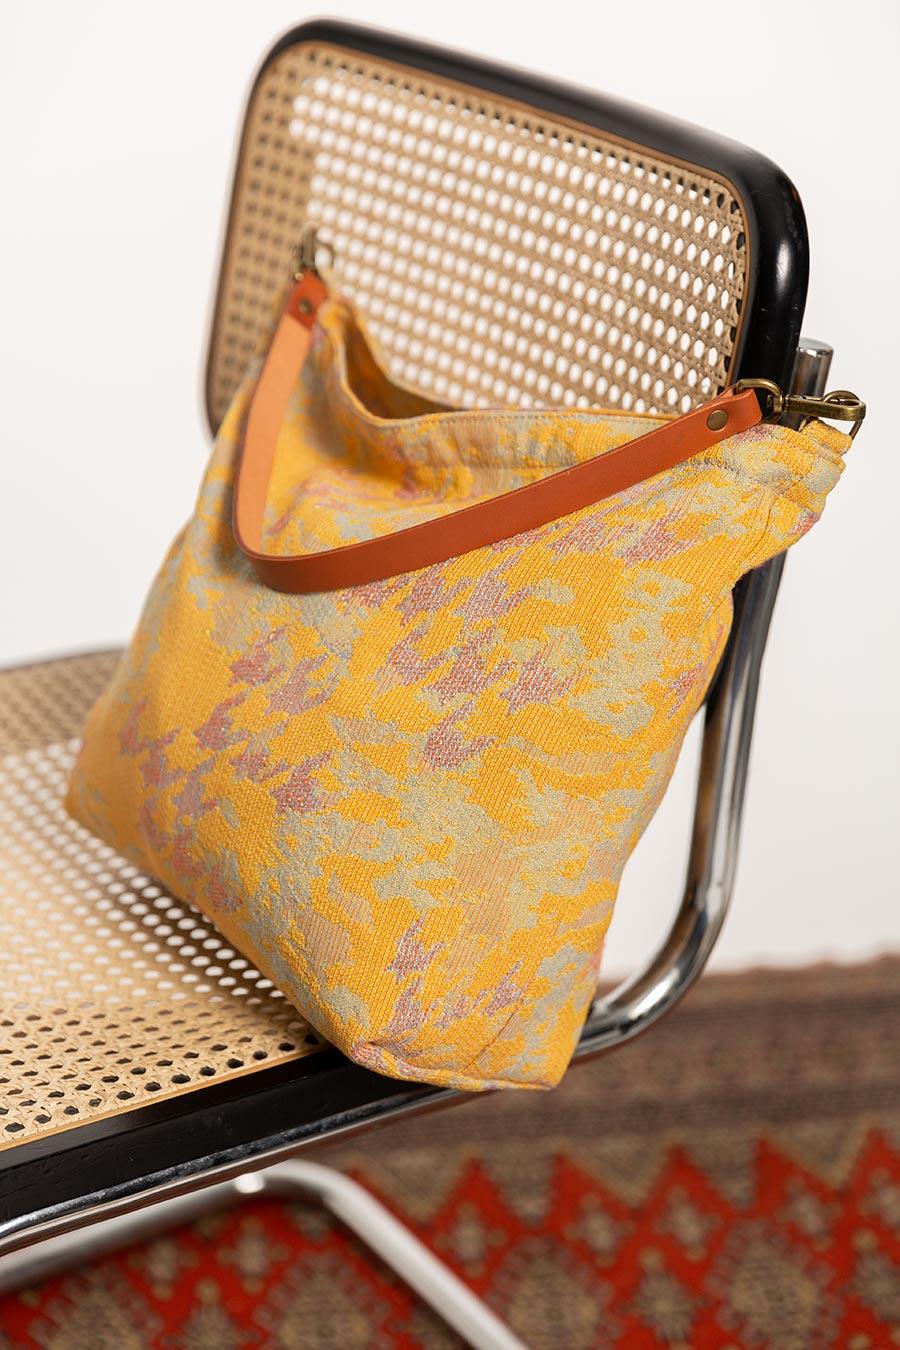 OTRORA_Bolso artesanal de jacquard amarillo con asa de cuero